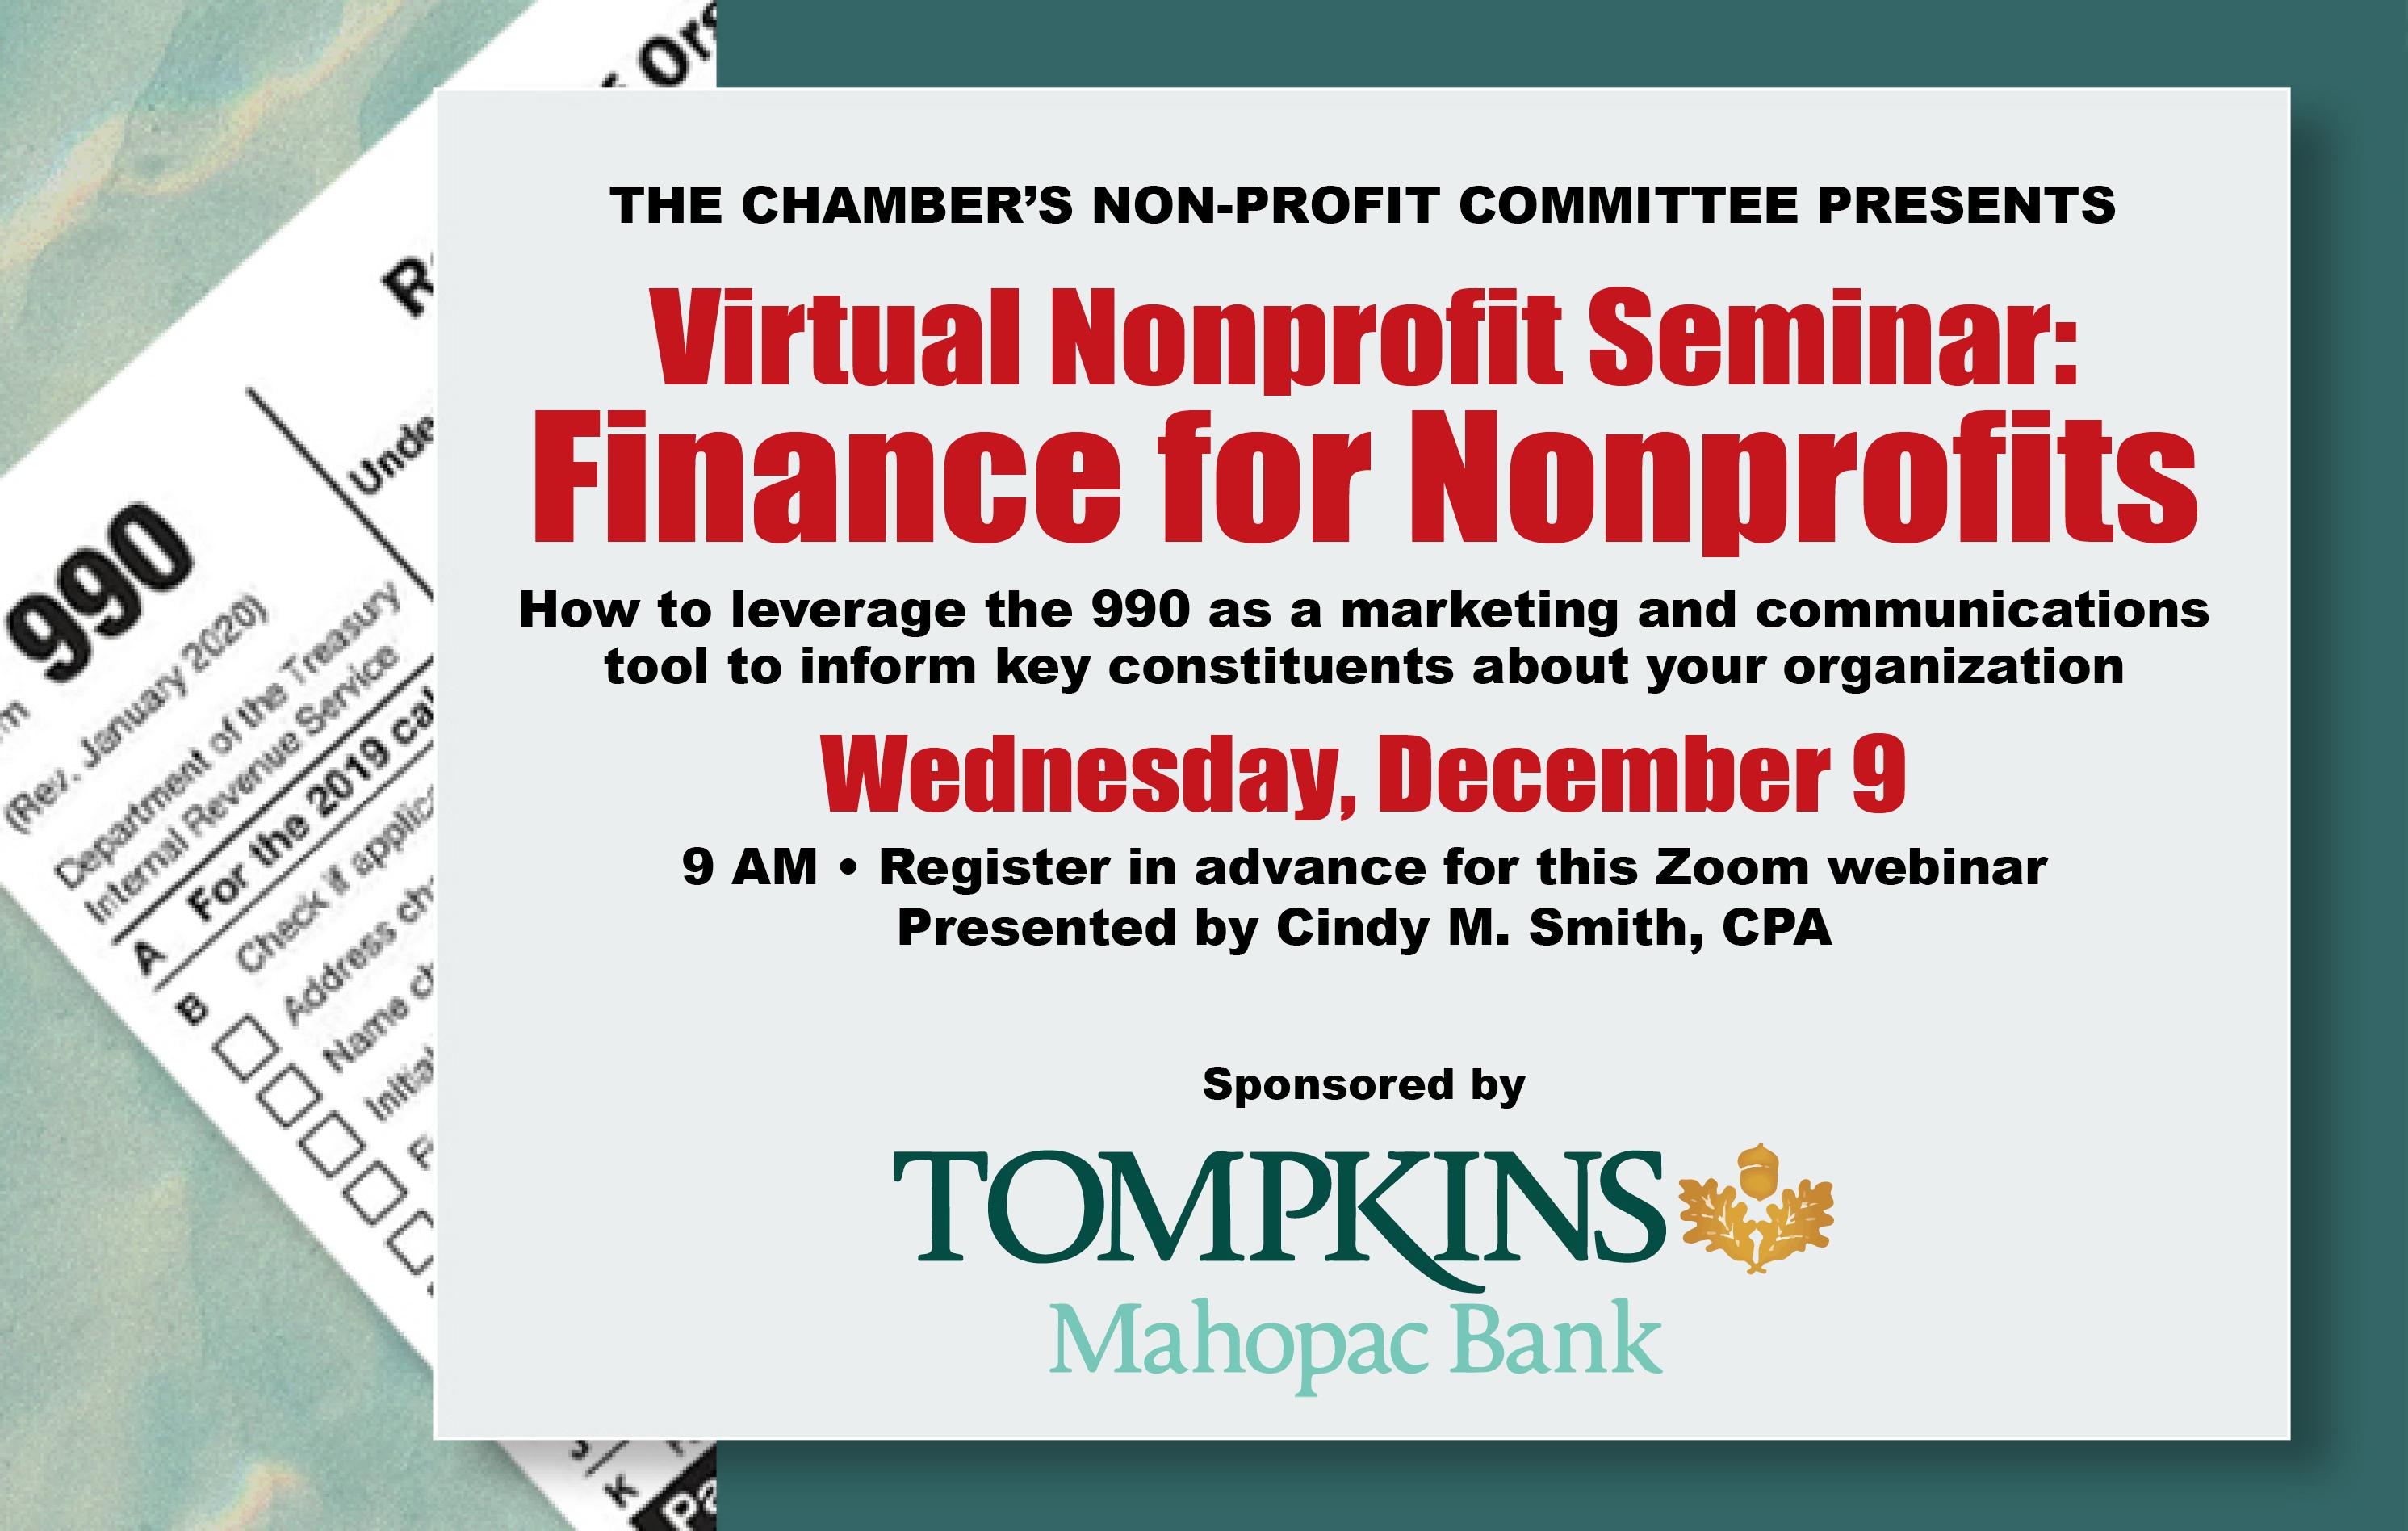 NonProfit-Seminar.jpg